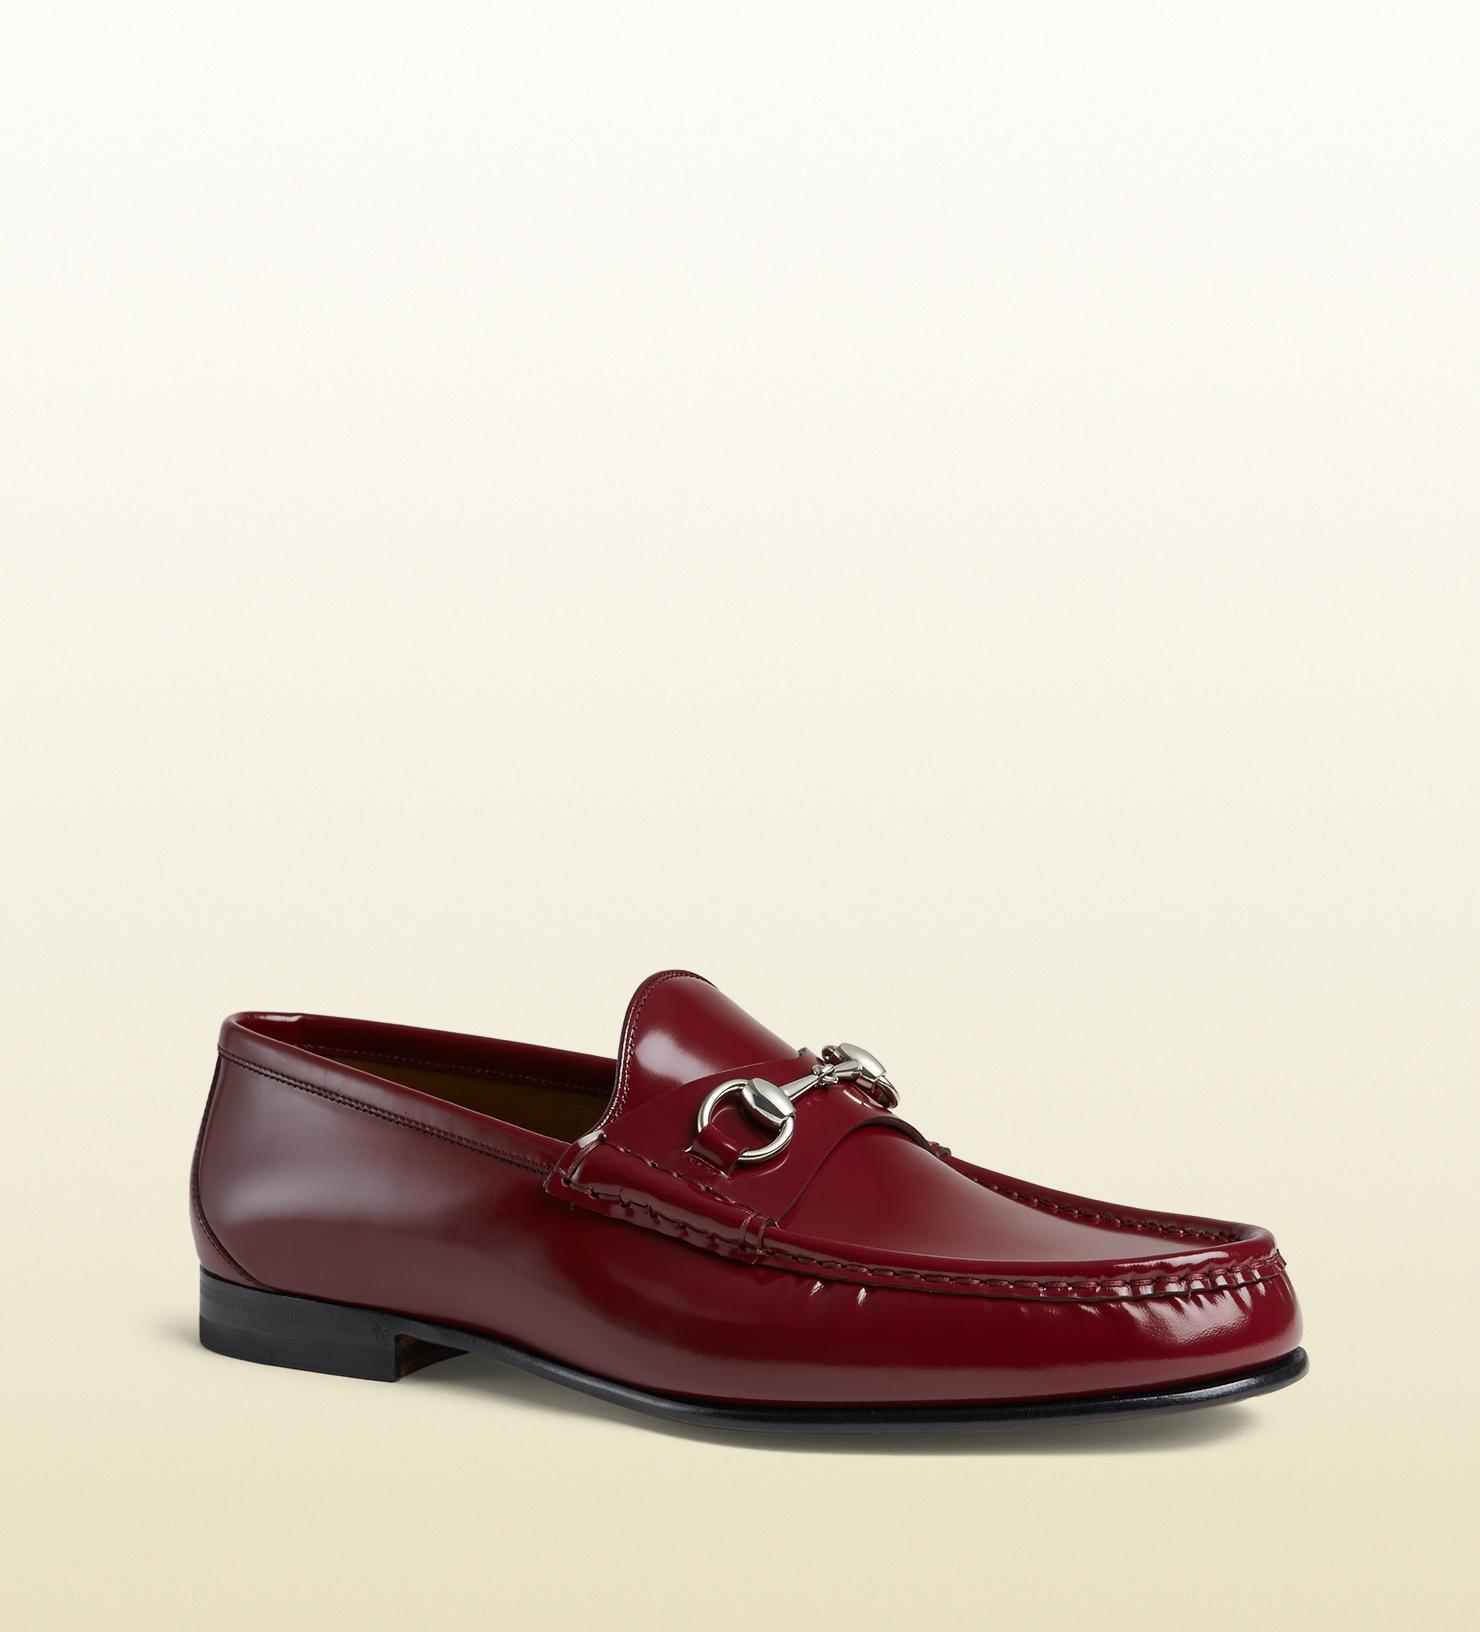 41487e4cd83 Lyst - Gucci Men s Brushed Leather Horsebit Loafer in Red for Men